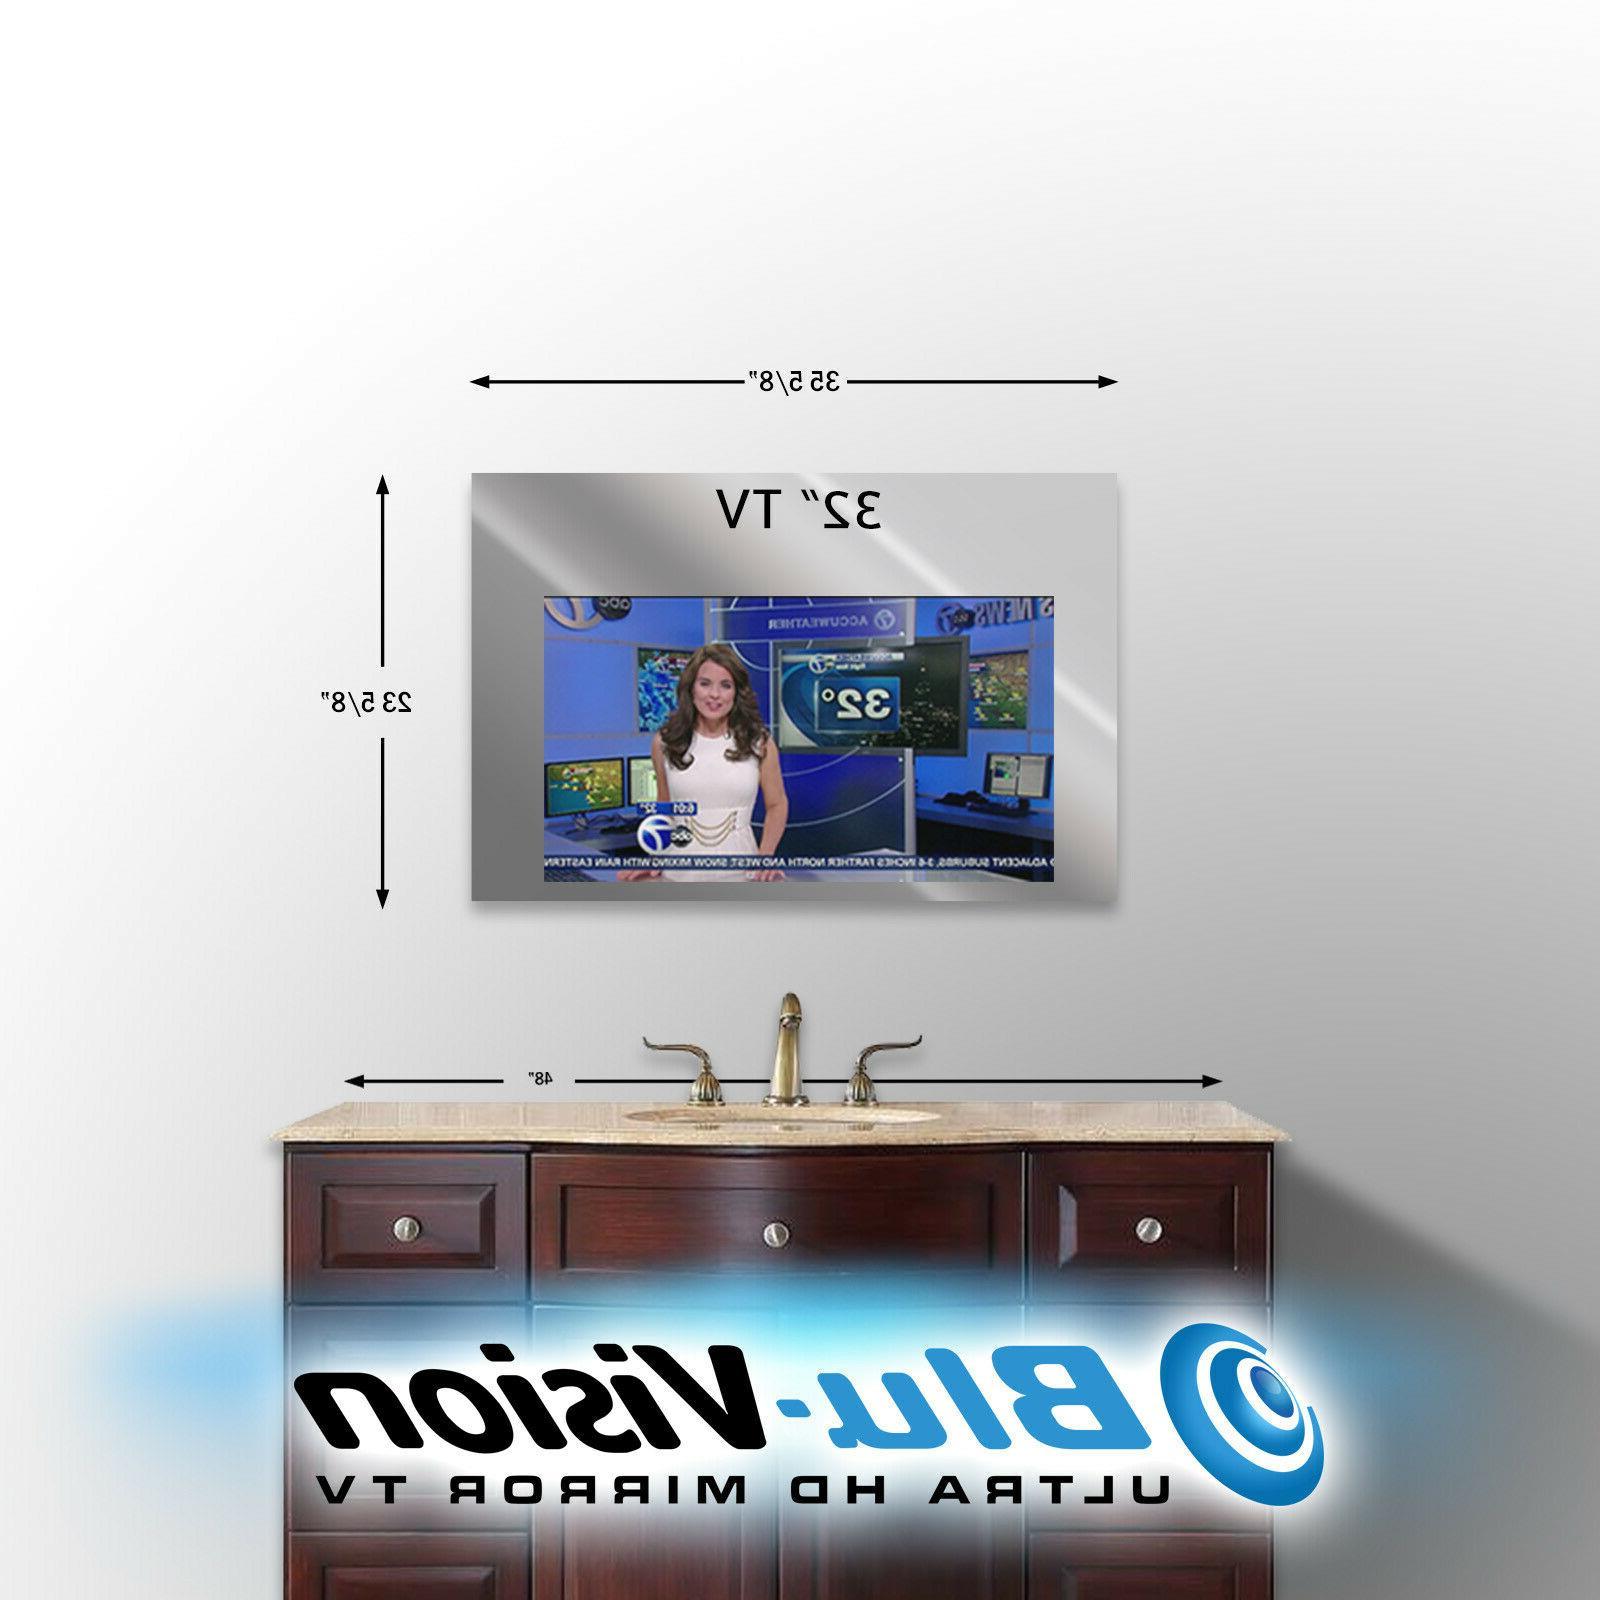 "VANITY LG 24"" CLASS HDTV X 23 SUMMER"